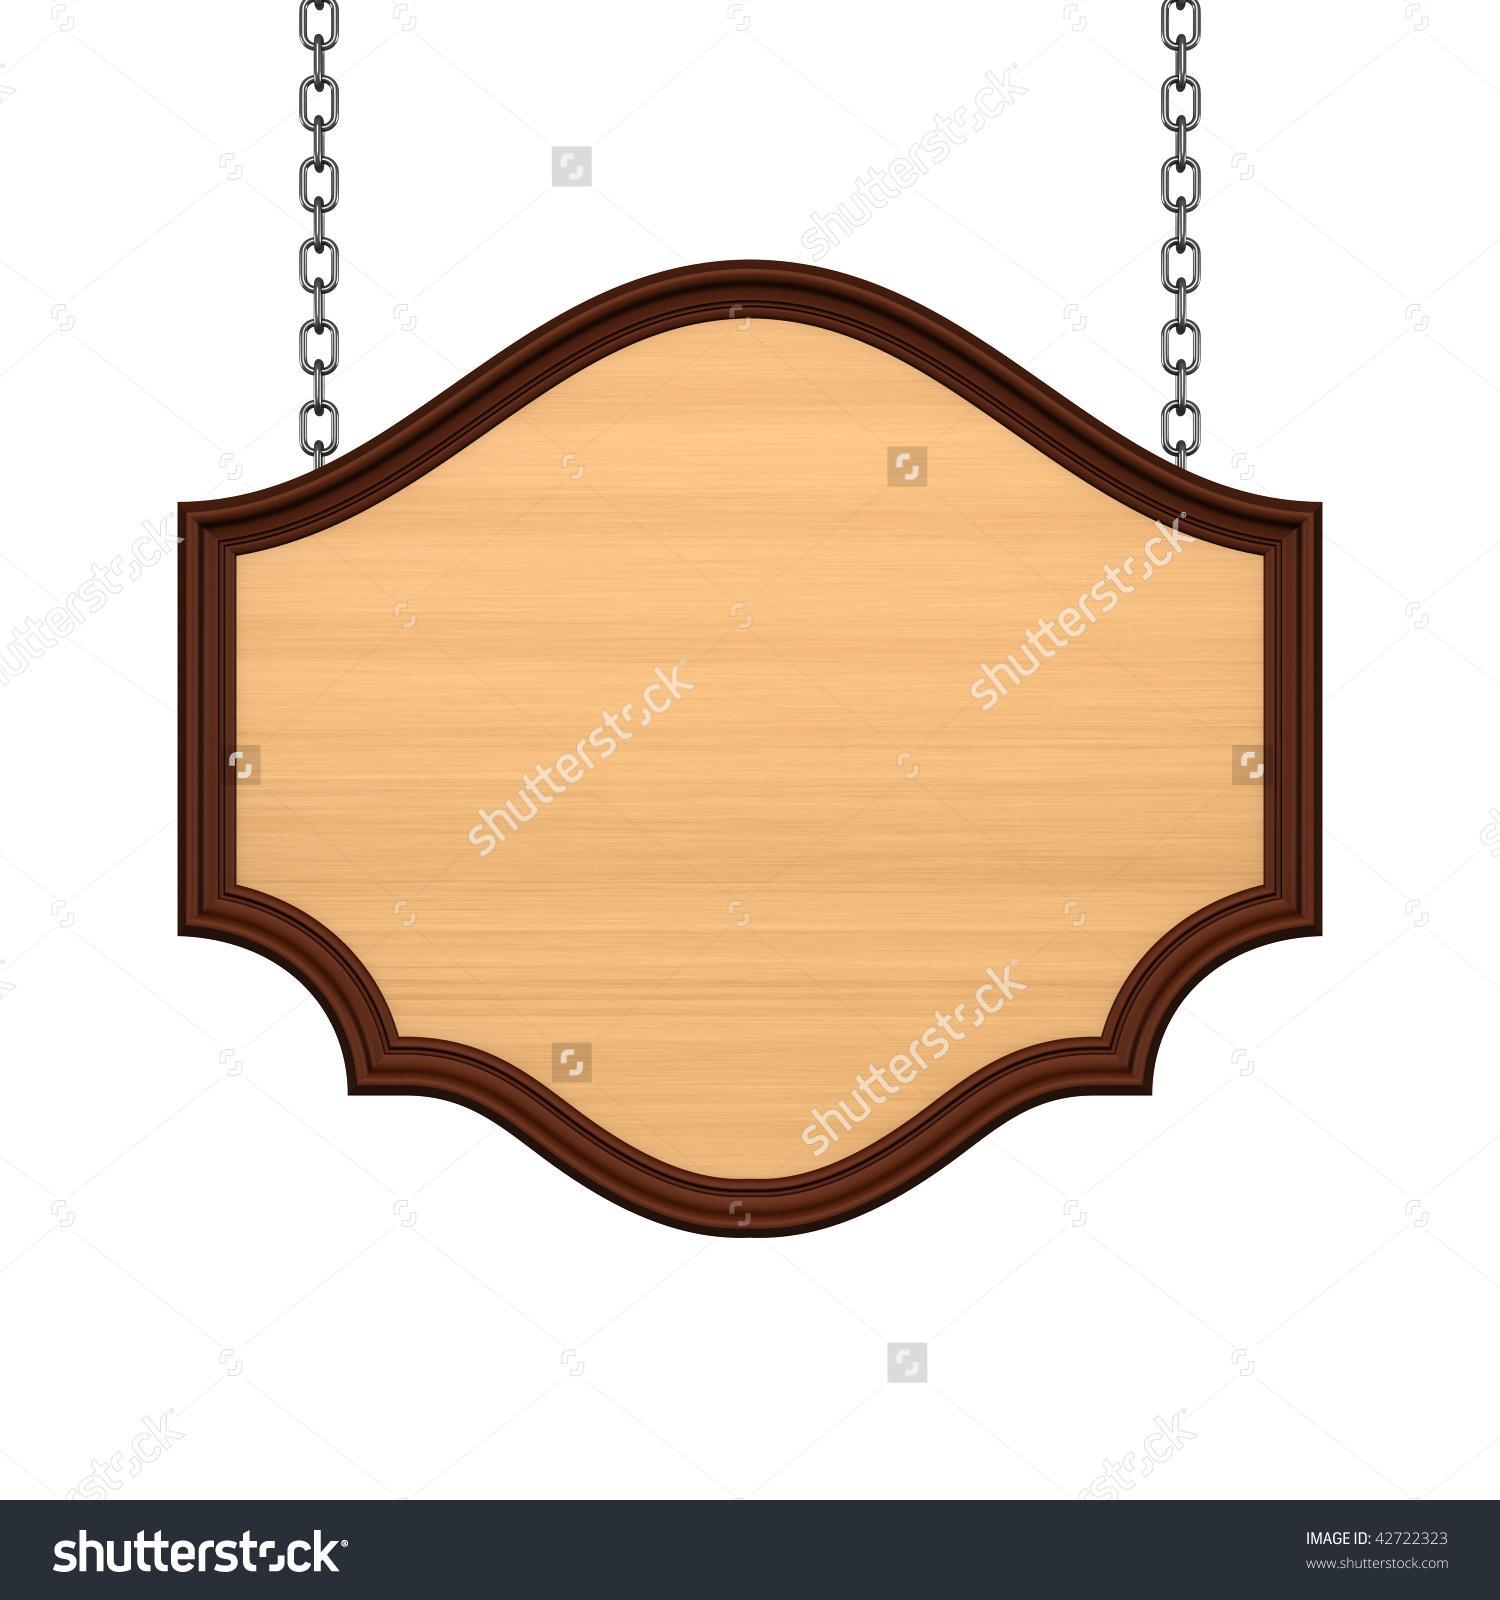 Wooden Signboard Chain Stock Illustration 42722323.